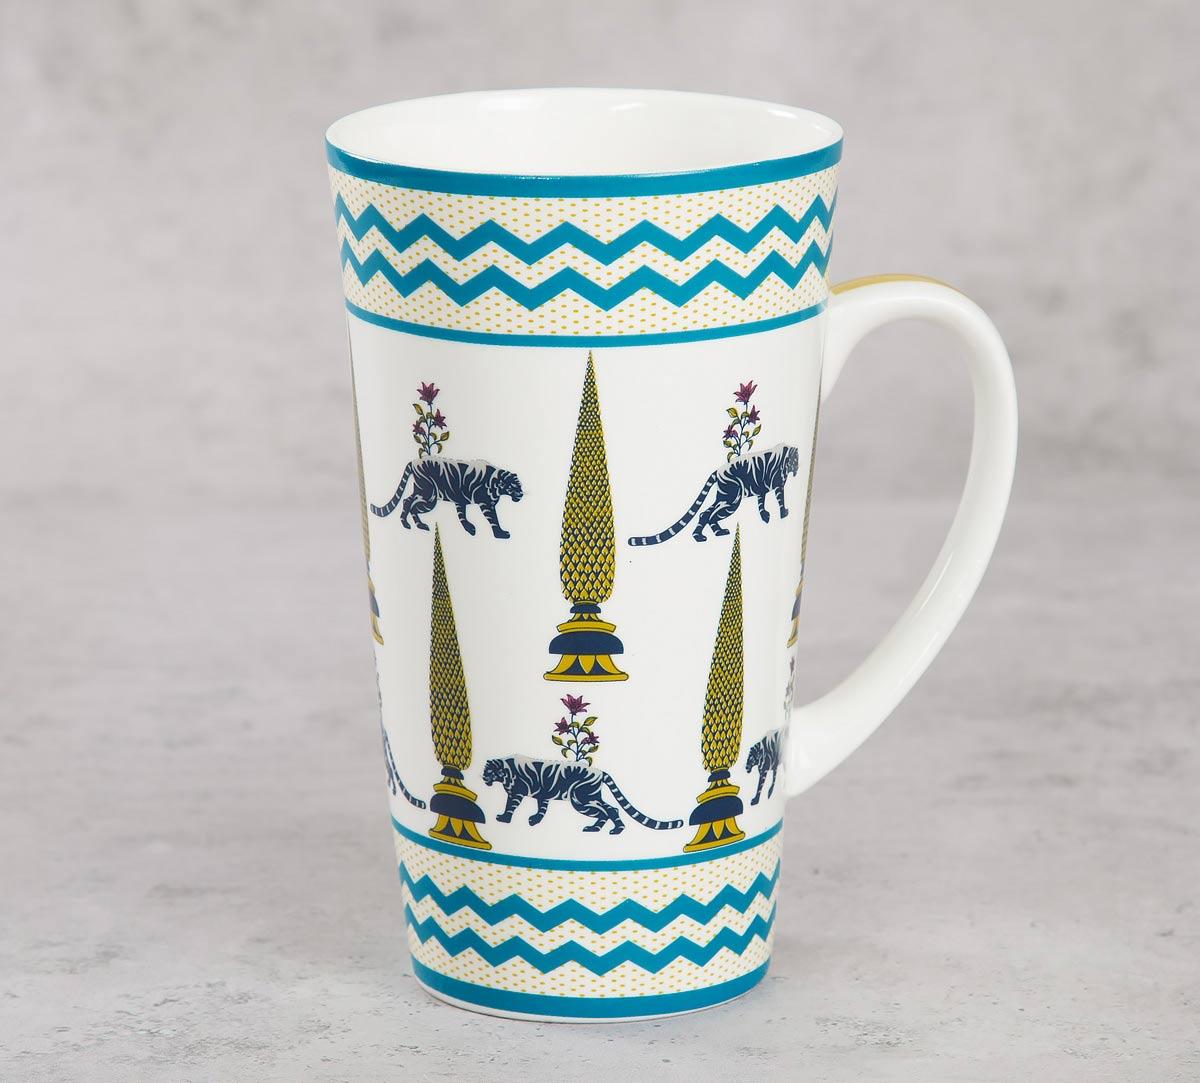 Mystical Garden Conical Mug (Set of 2)